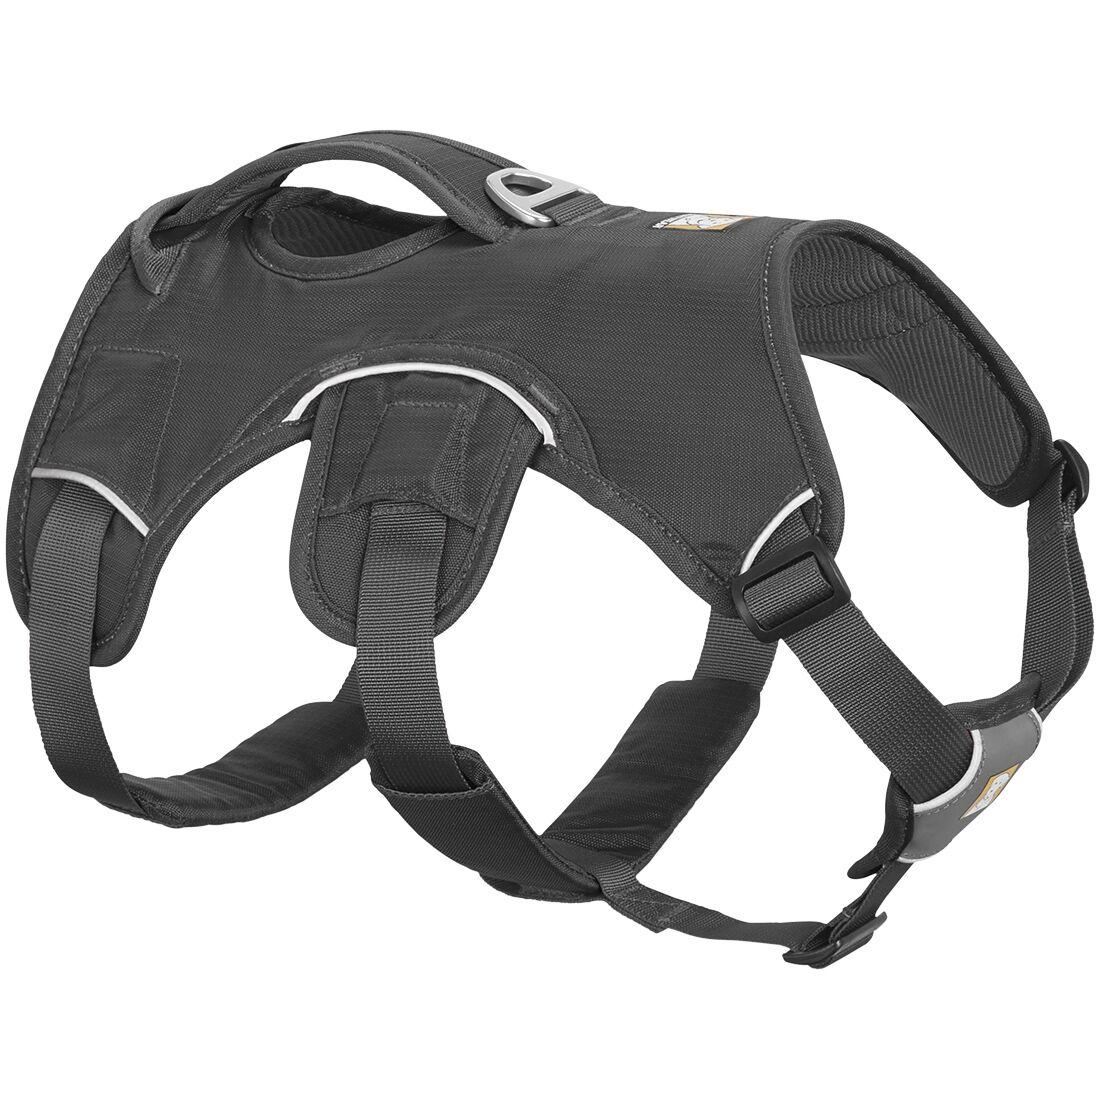 Ruffwear Harnais pour chien Ruffwear Web Master gris Taille : XS